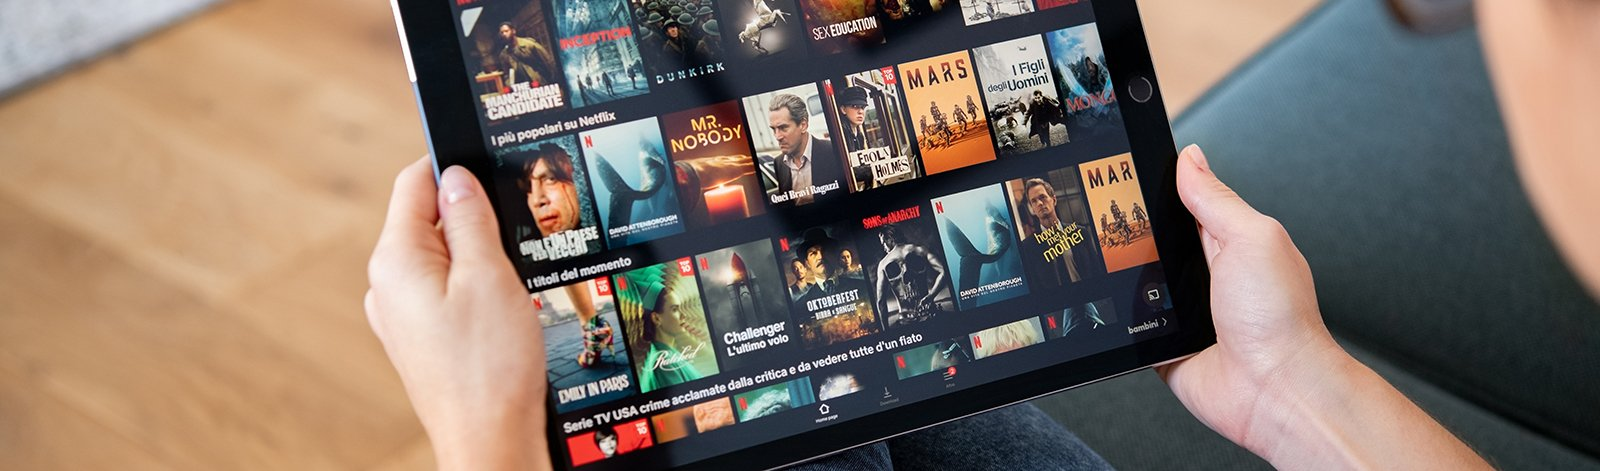 Woman watching Netflix on digital tablet